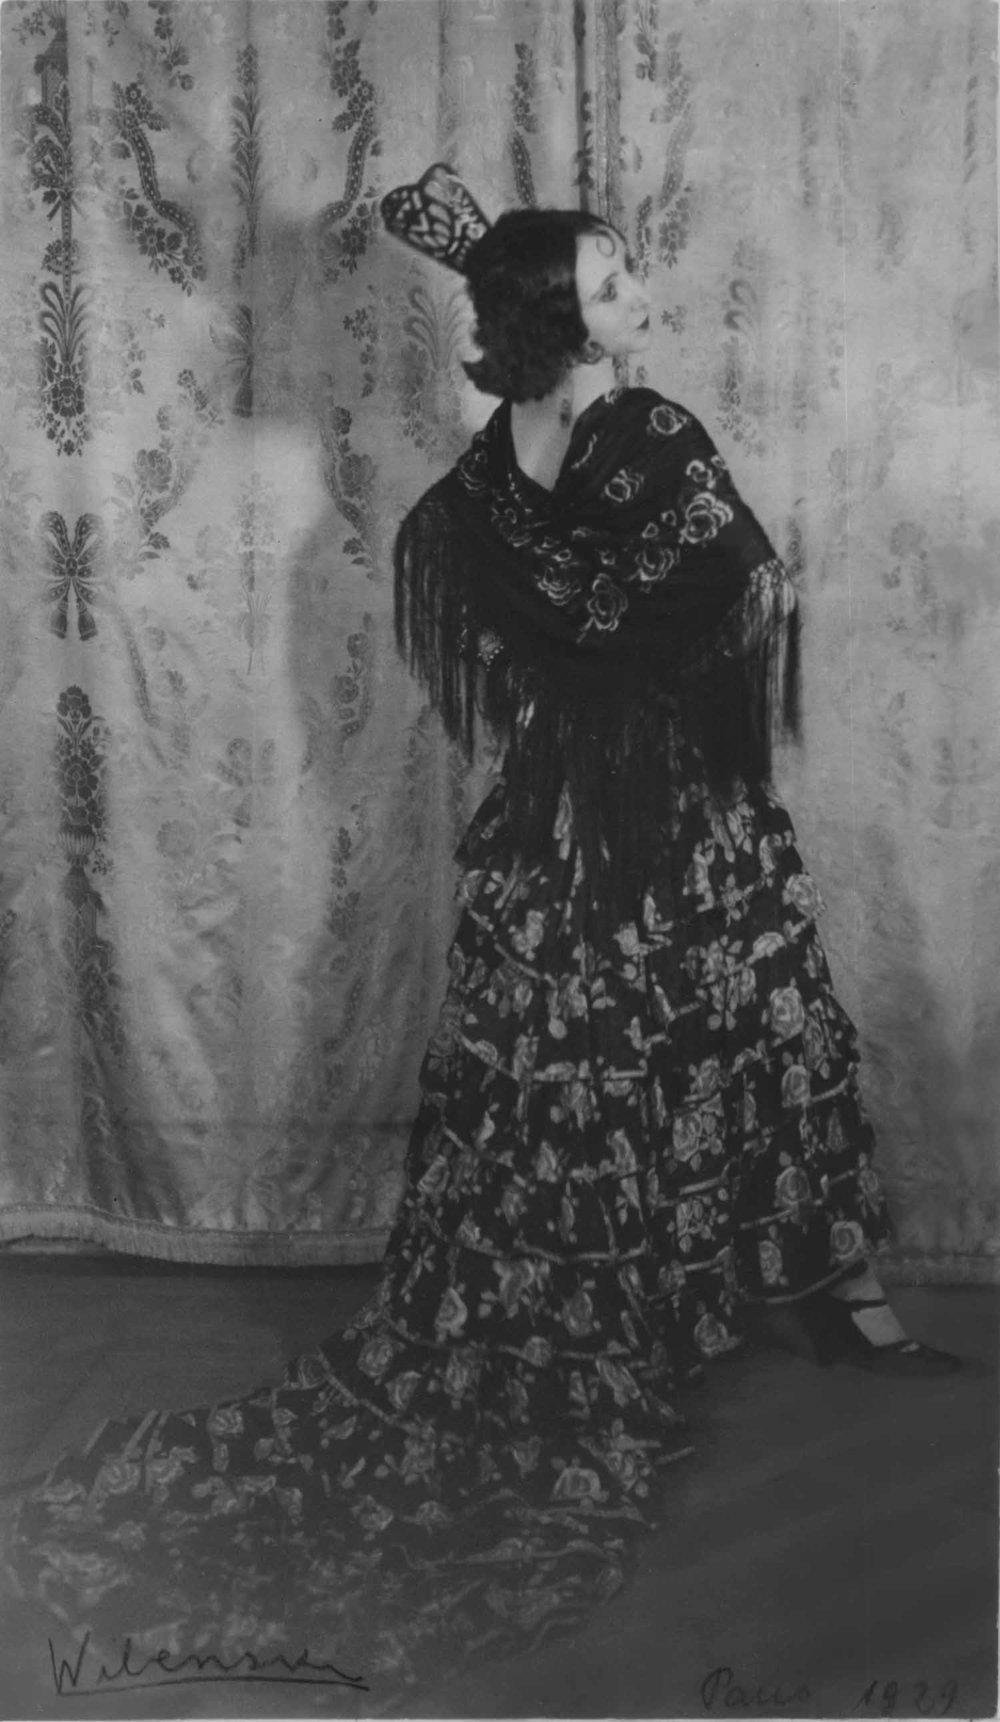 Anais 1929 Wilenski Spanish dance.jpg